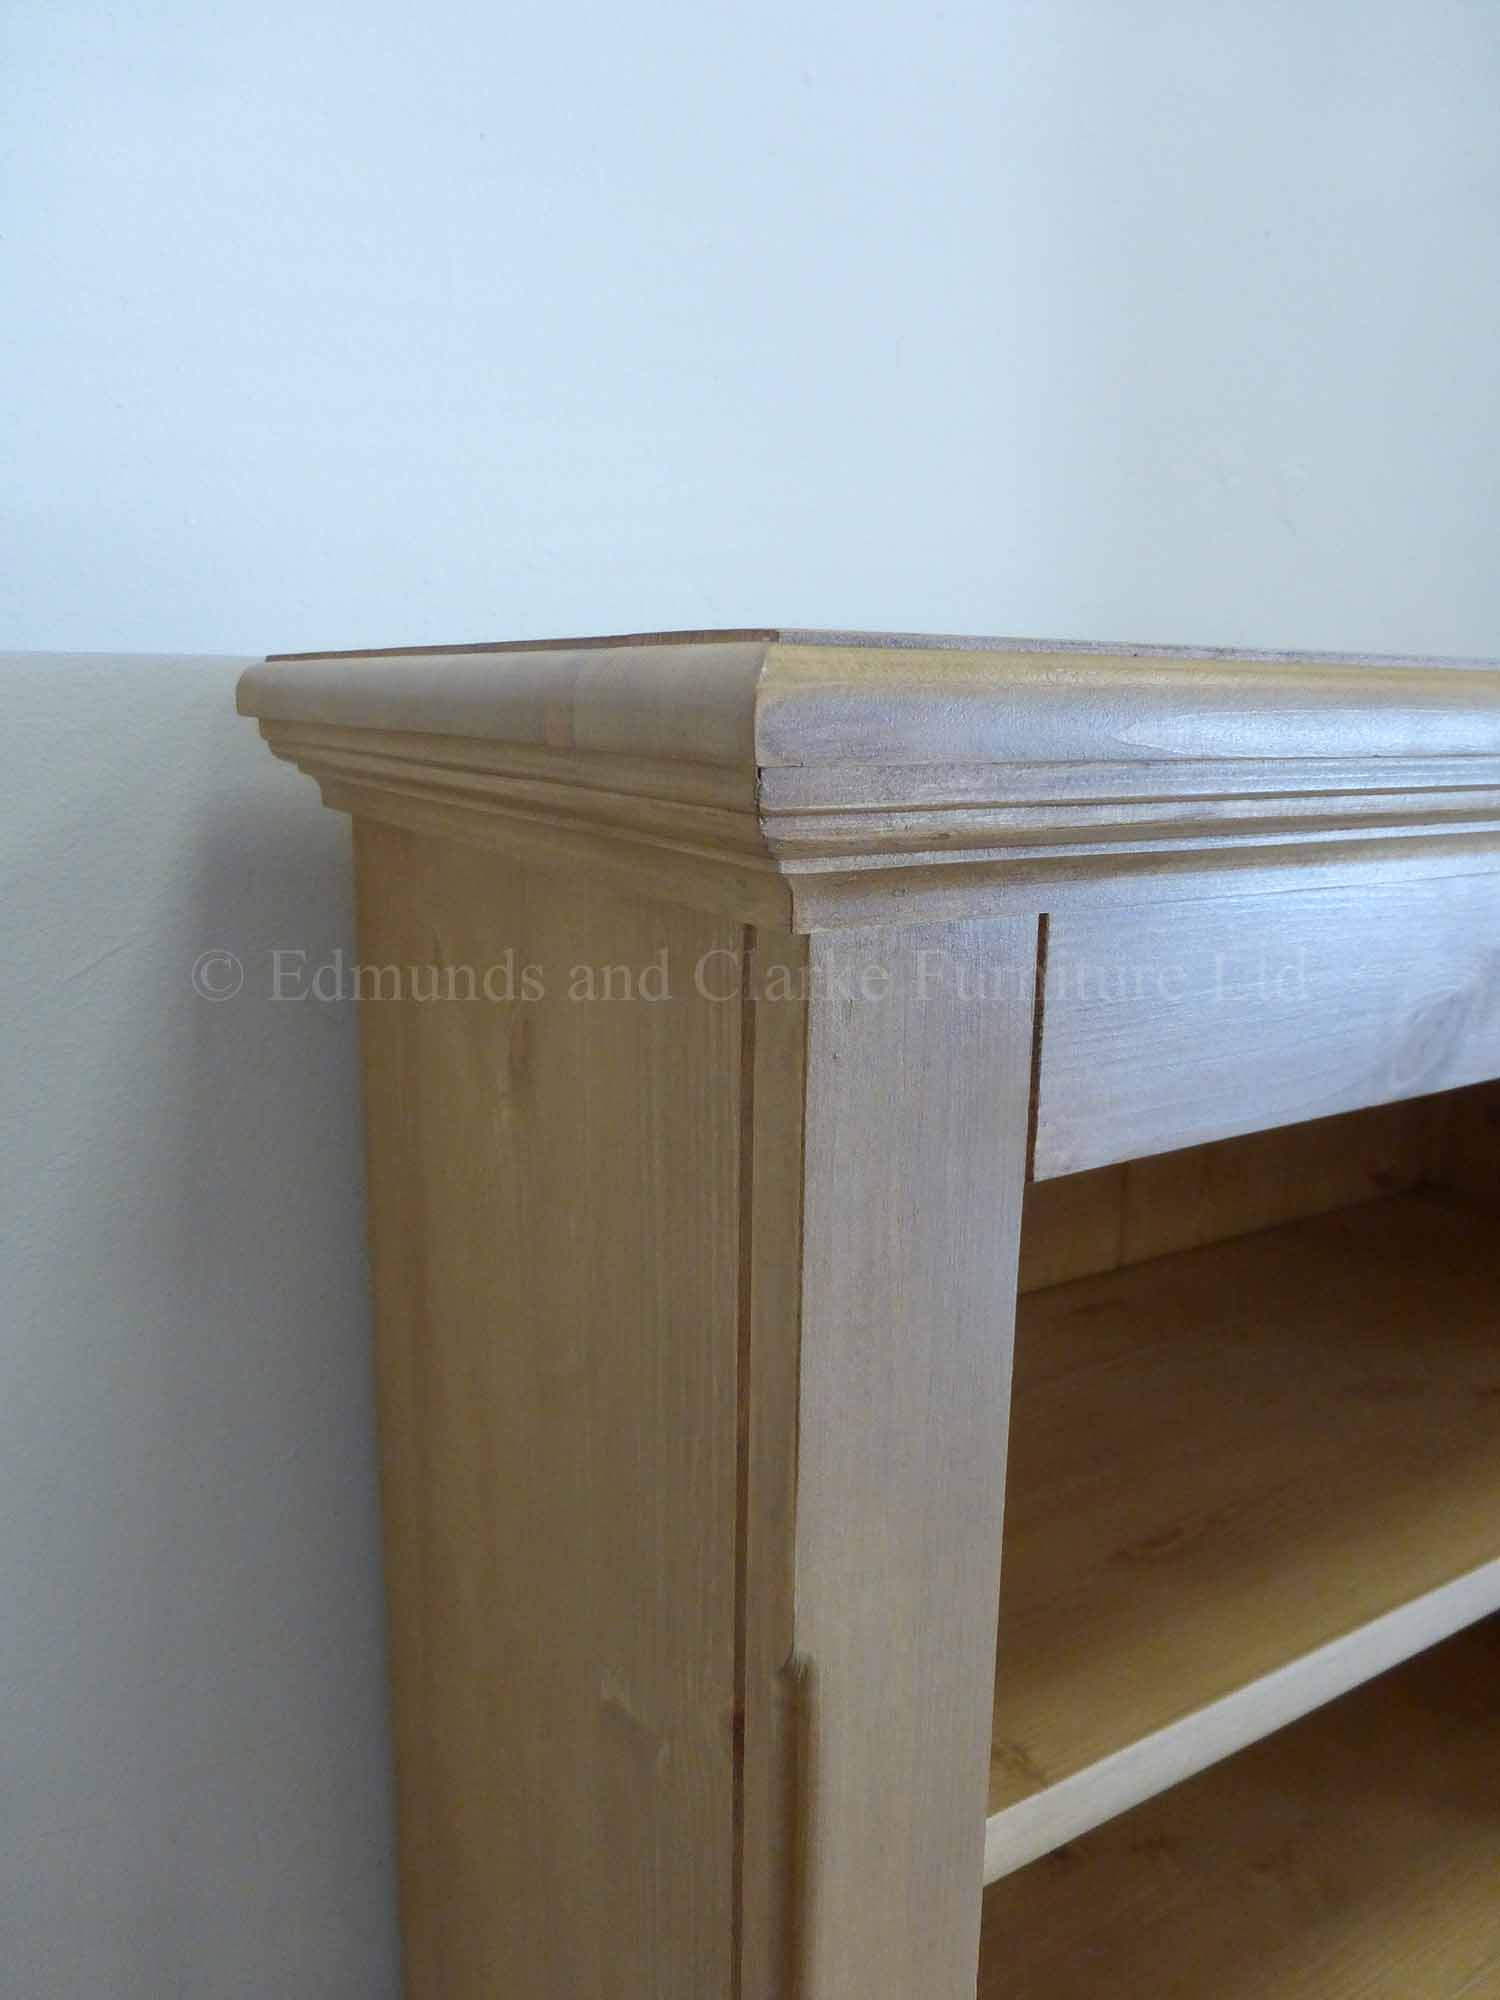 Edmunds slim narrow waxed pine bookcase shelving